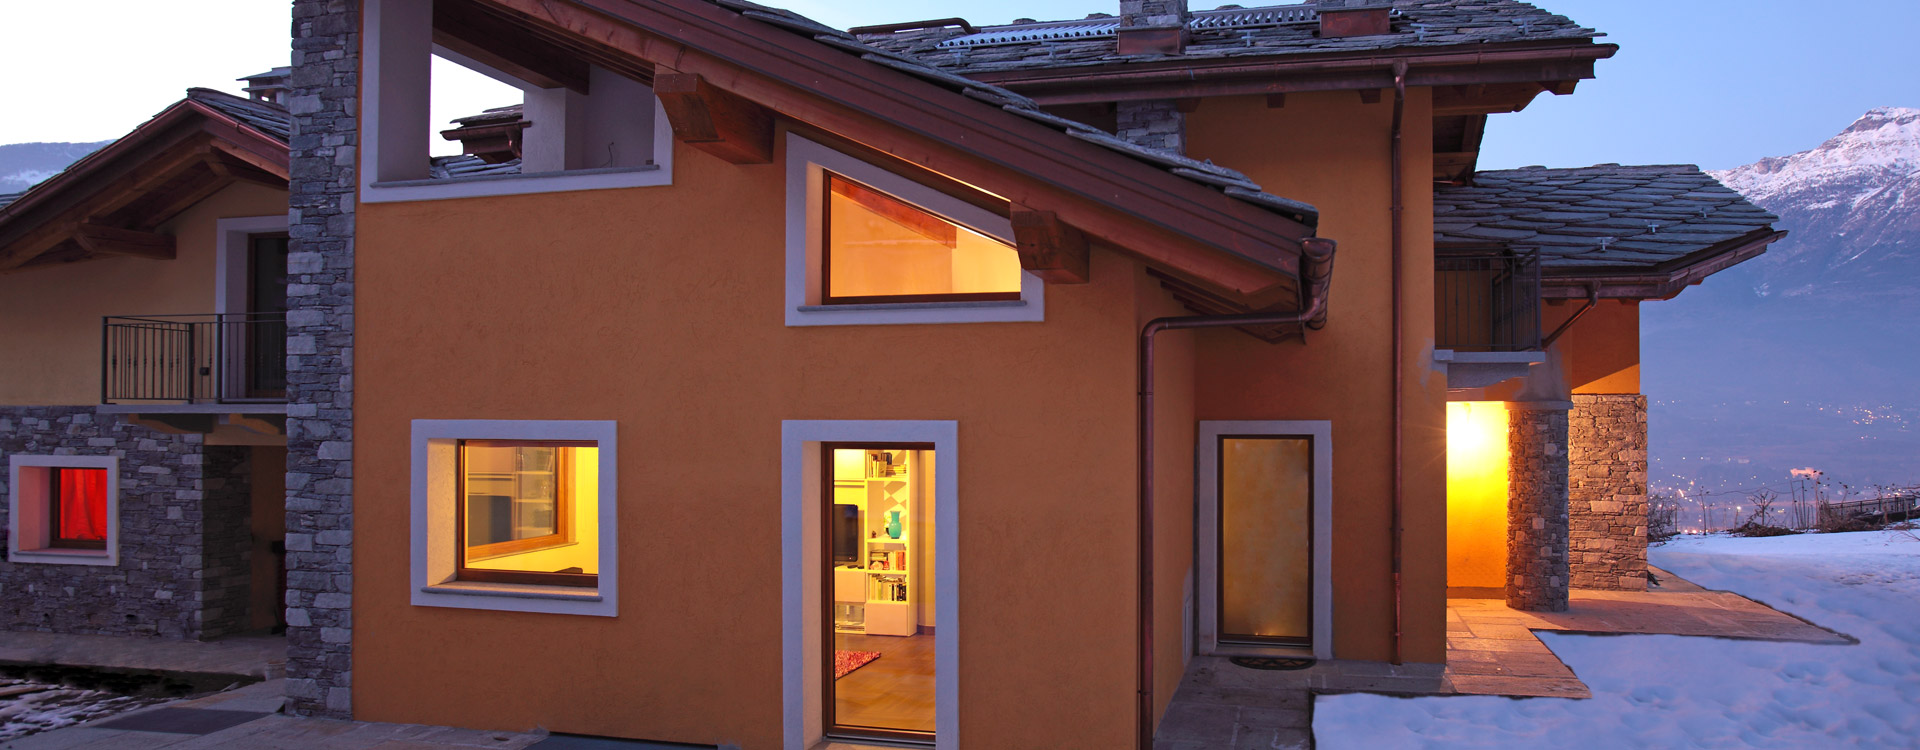 Una casa di stile